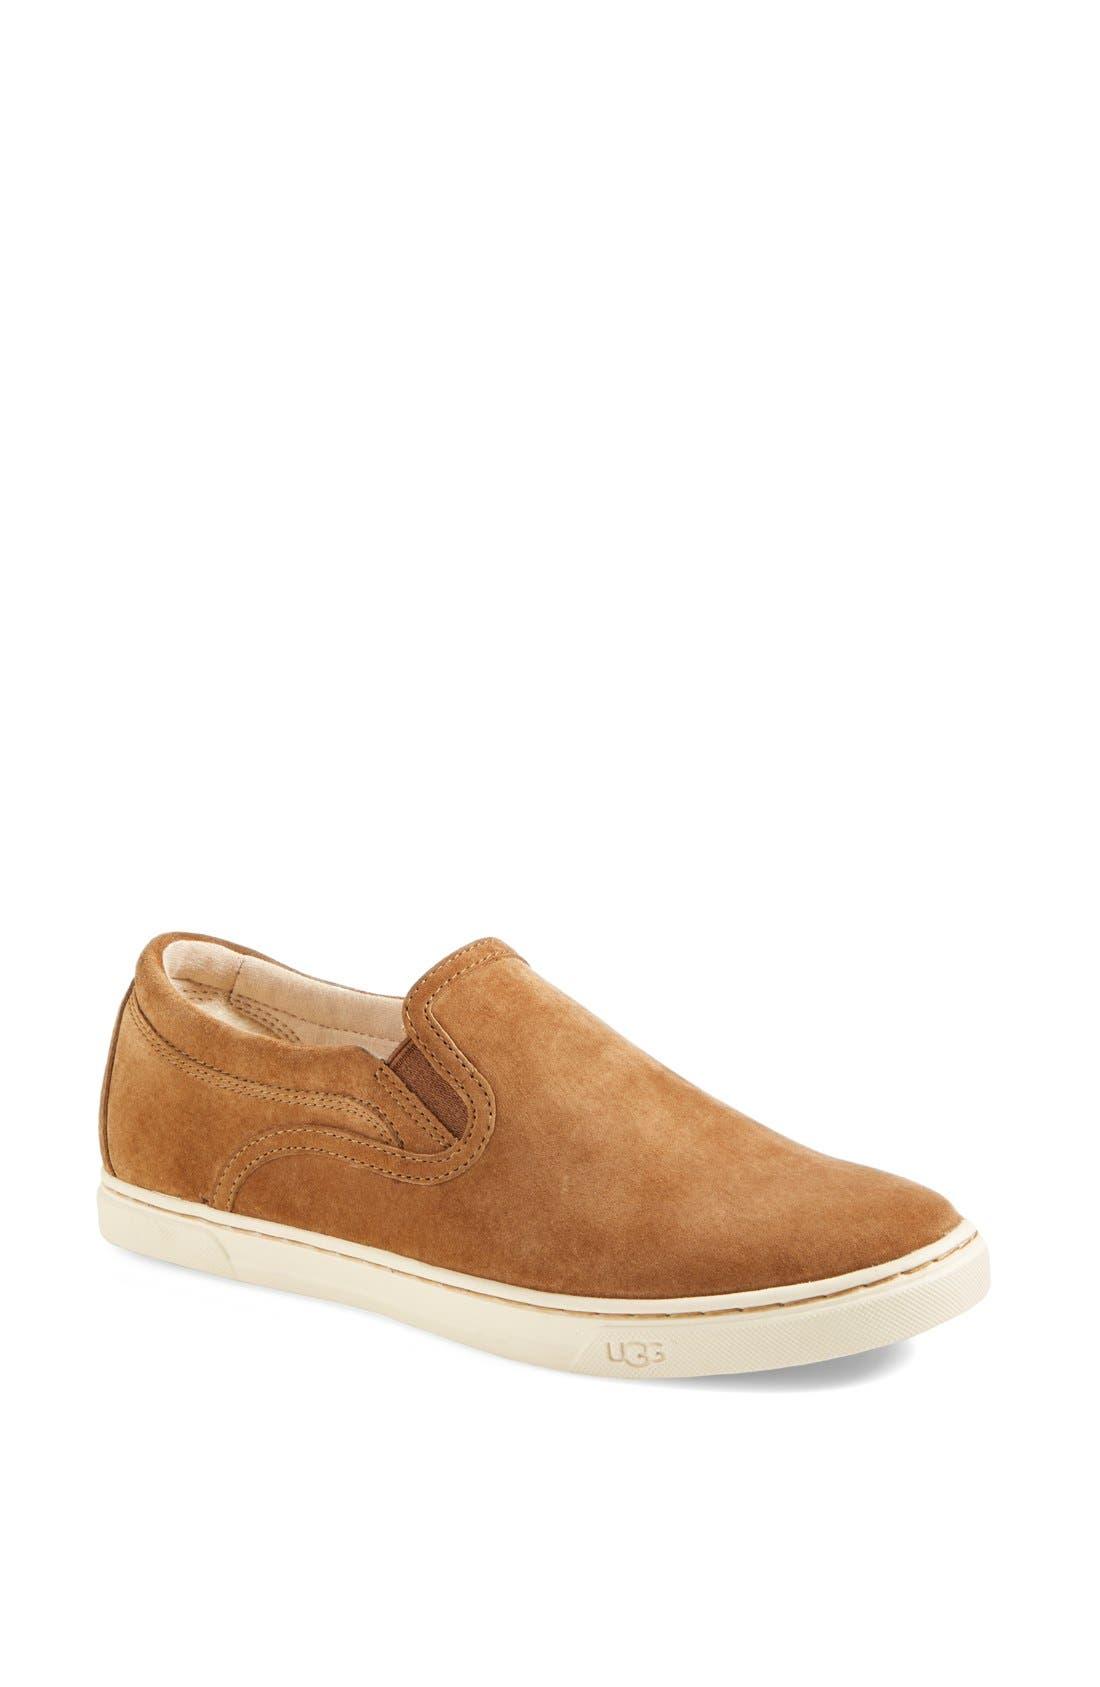 Main Image - UGG® Fierce Water Resistant Suede Slip-On Sneaker (Nordstrom Exclusive Color) (Women)